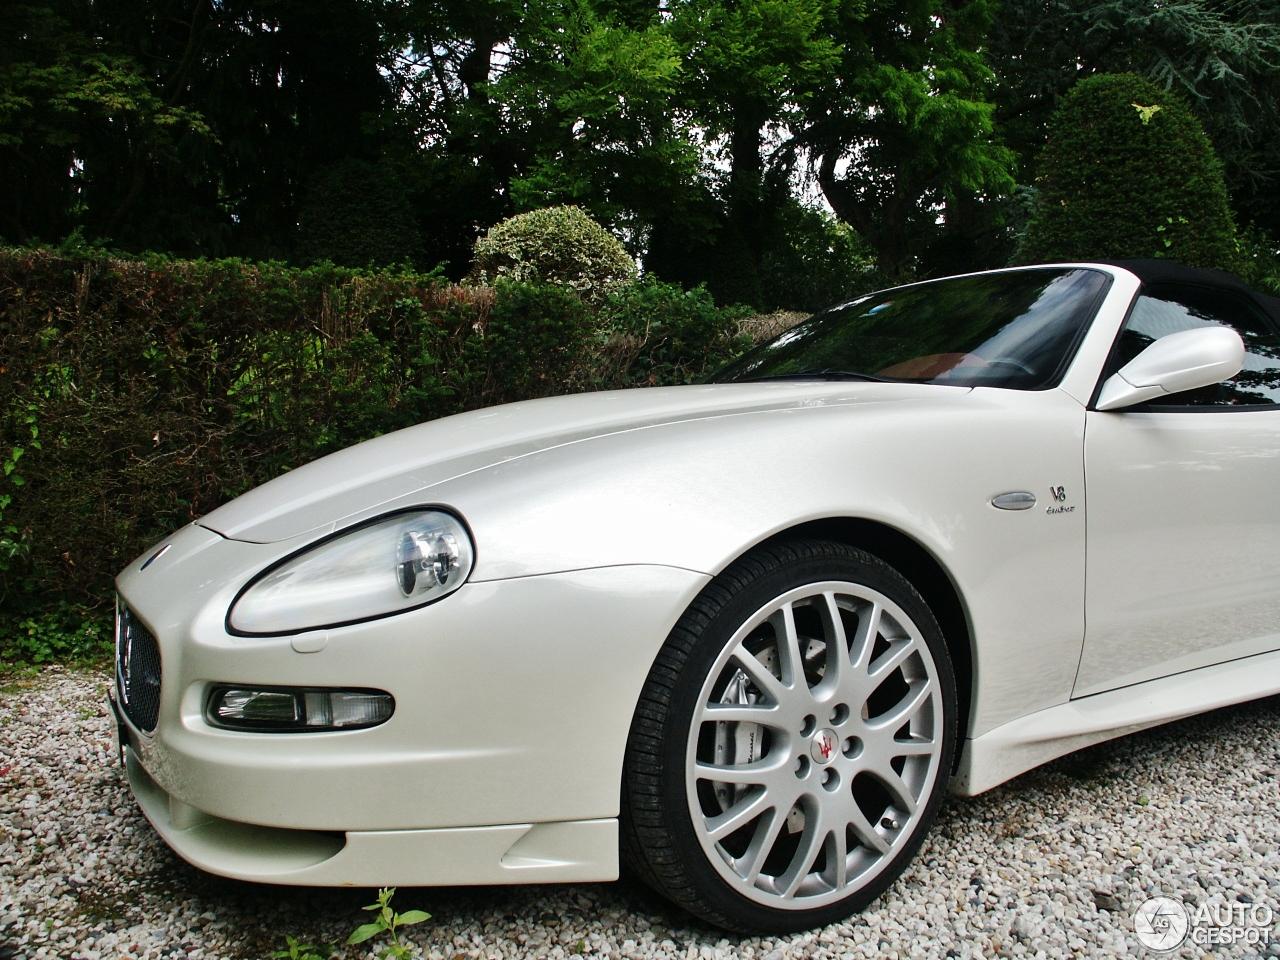 Maserati GranSport Spyder - 21 July 2013 - Autogespot